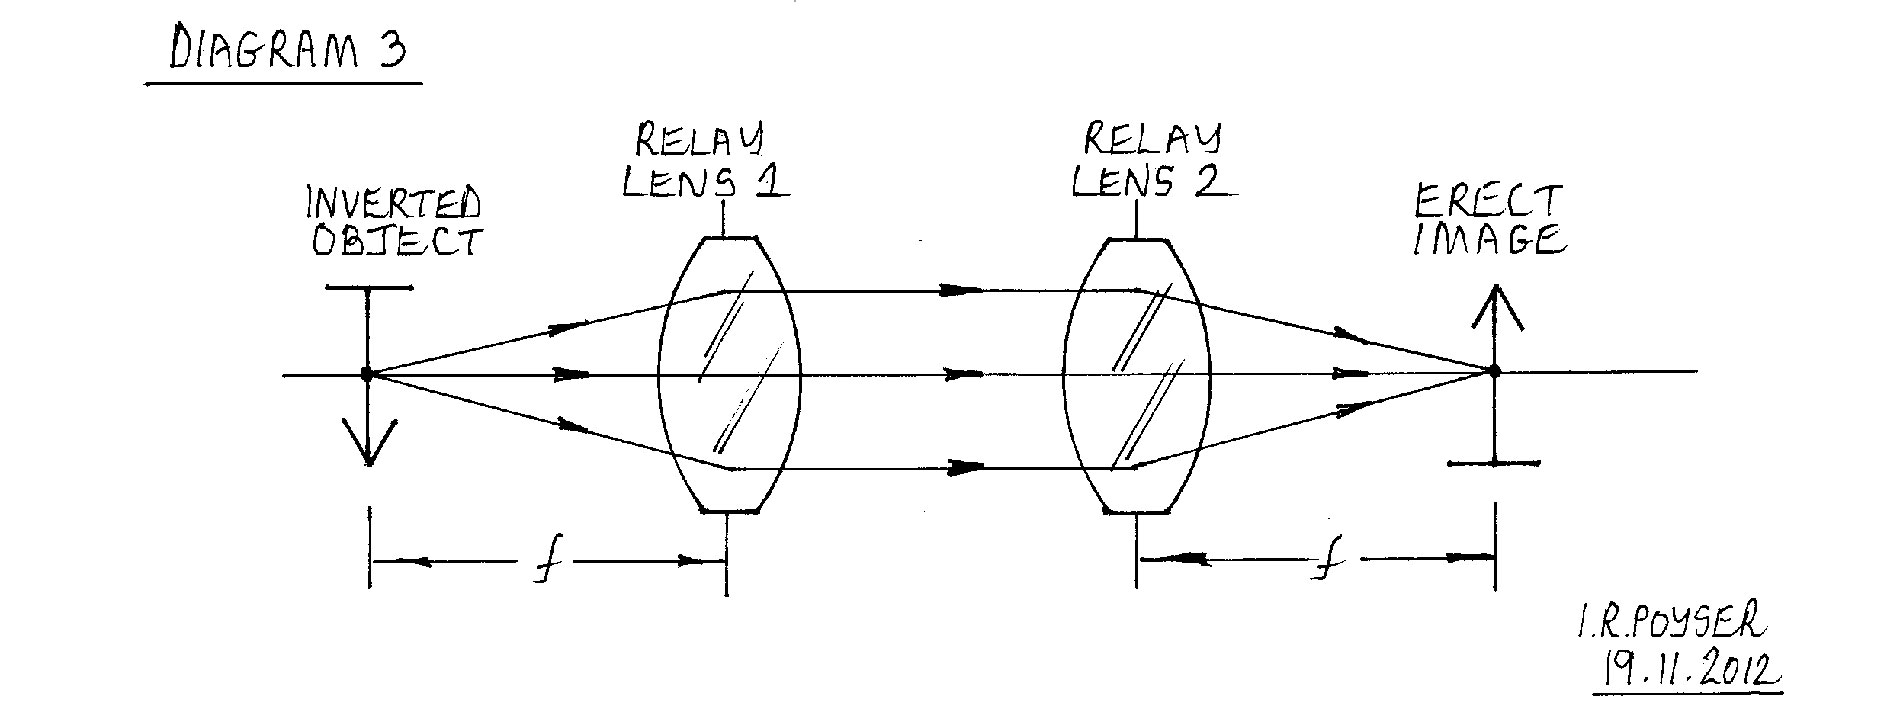 Relay Lens Diagram Wiring Data Switch Through